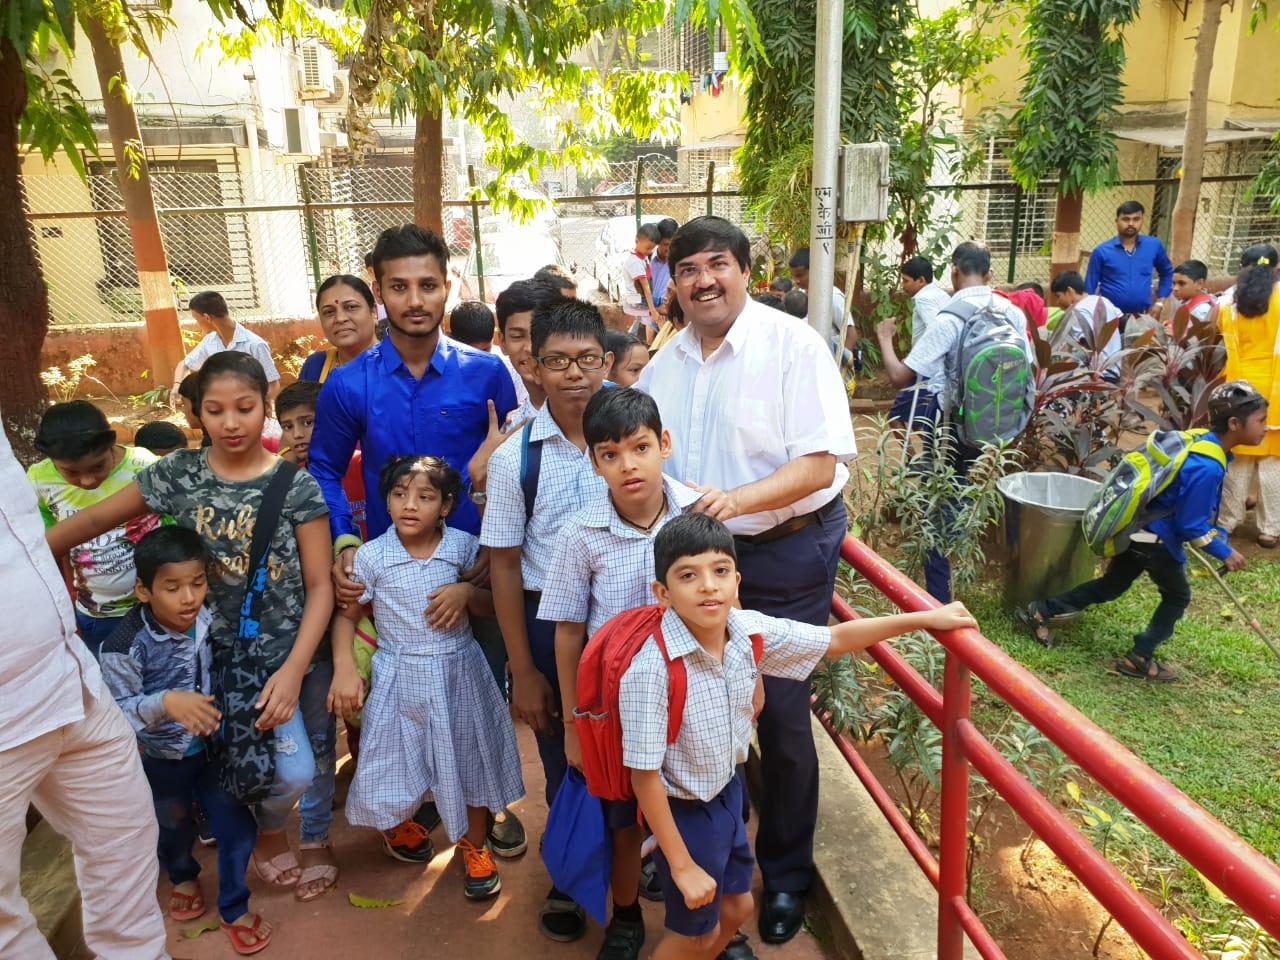 Nov 2018 Annual School Picnic – Mr Saurabh Sonawalla with the students